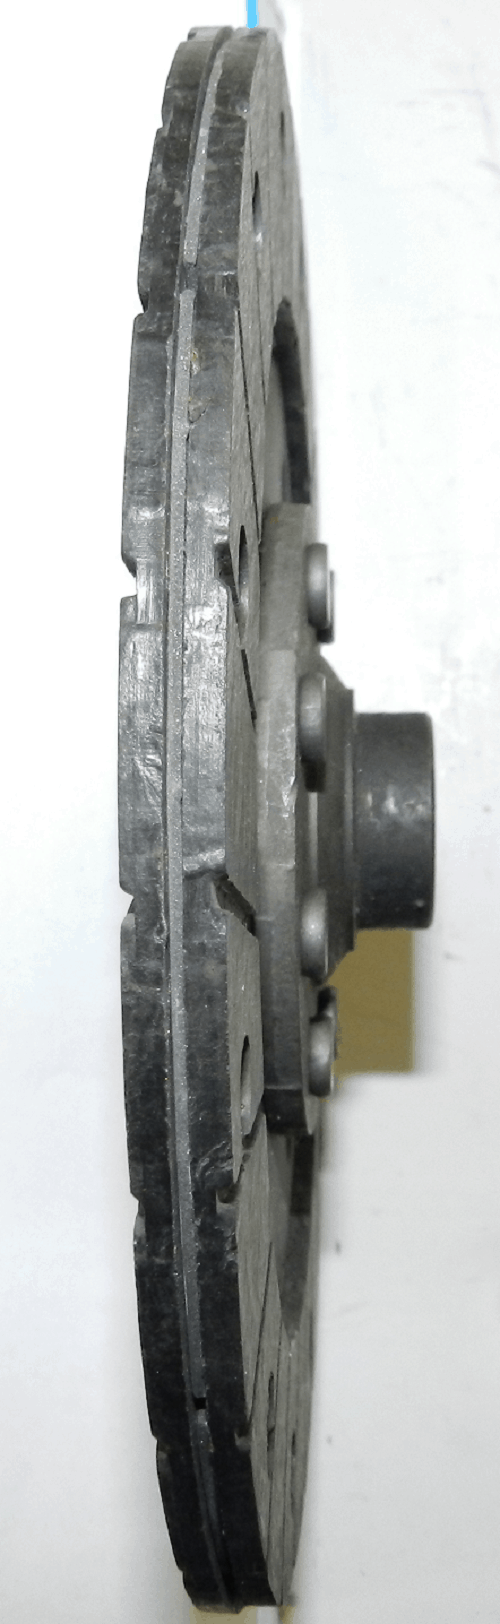 Disco Frizione 181x20x23 - T1820231